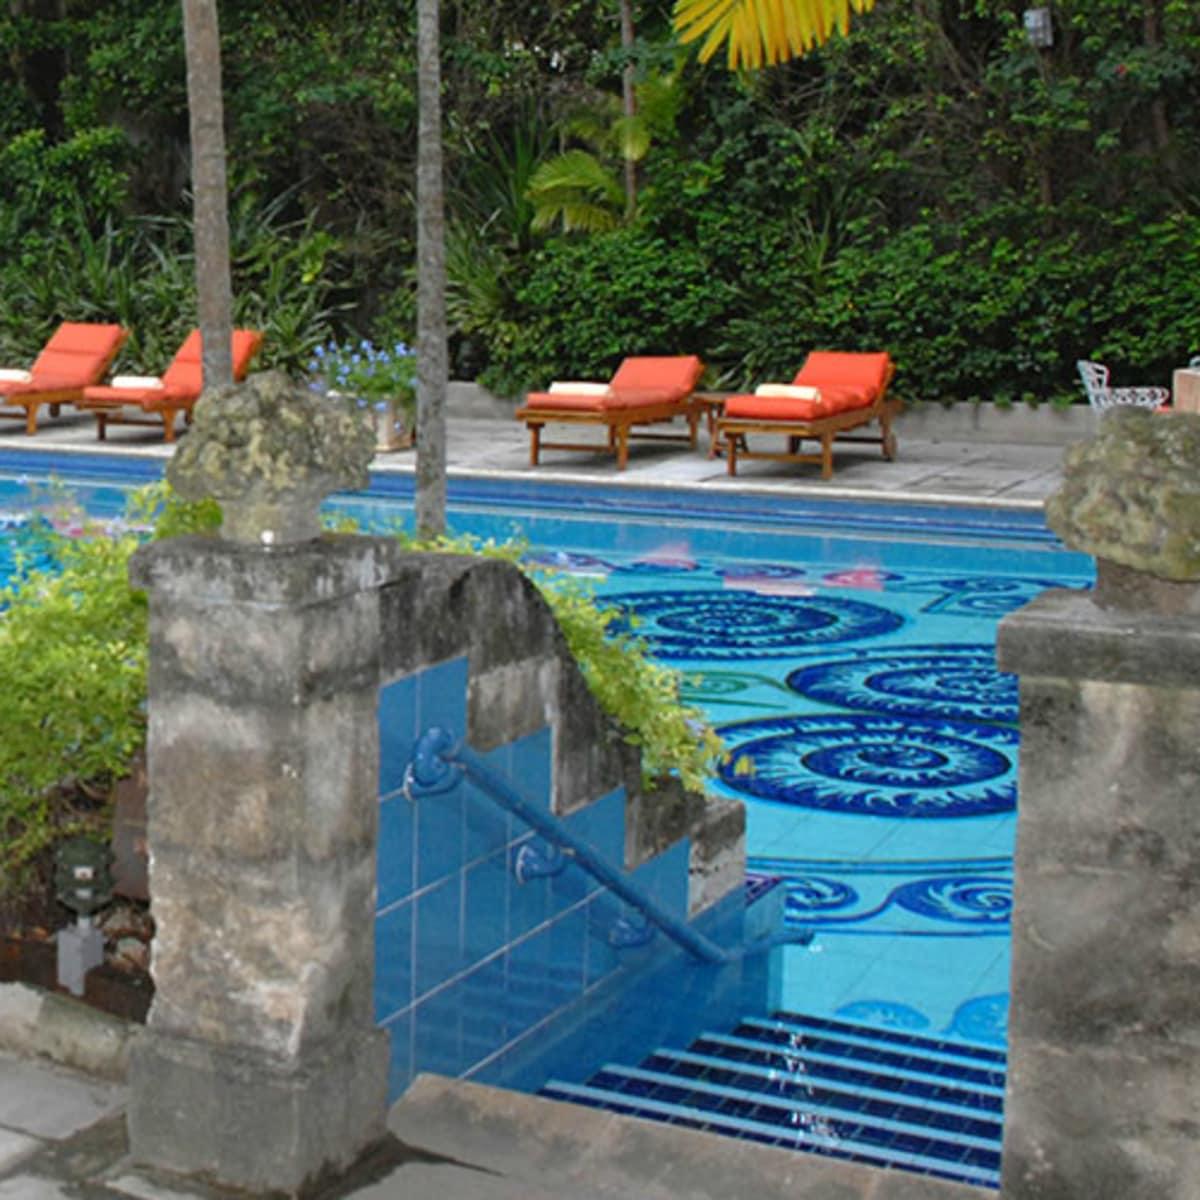 Graycliff Hotel pool exterior